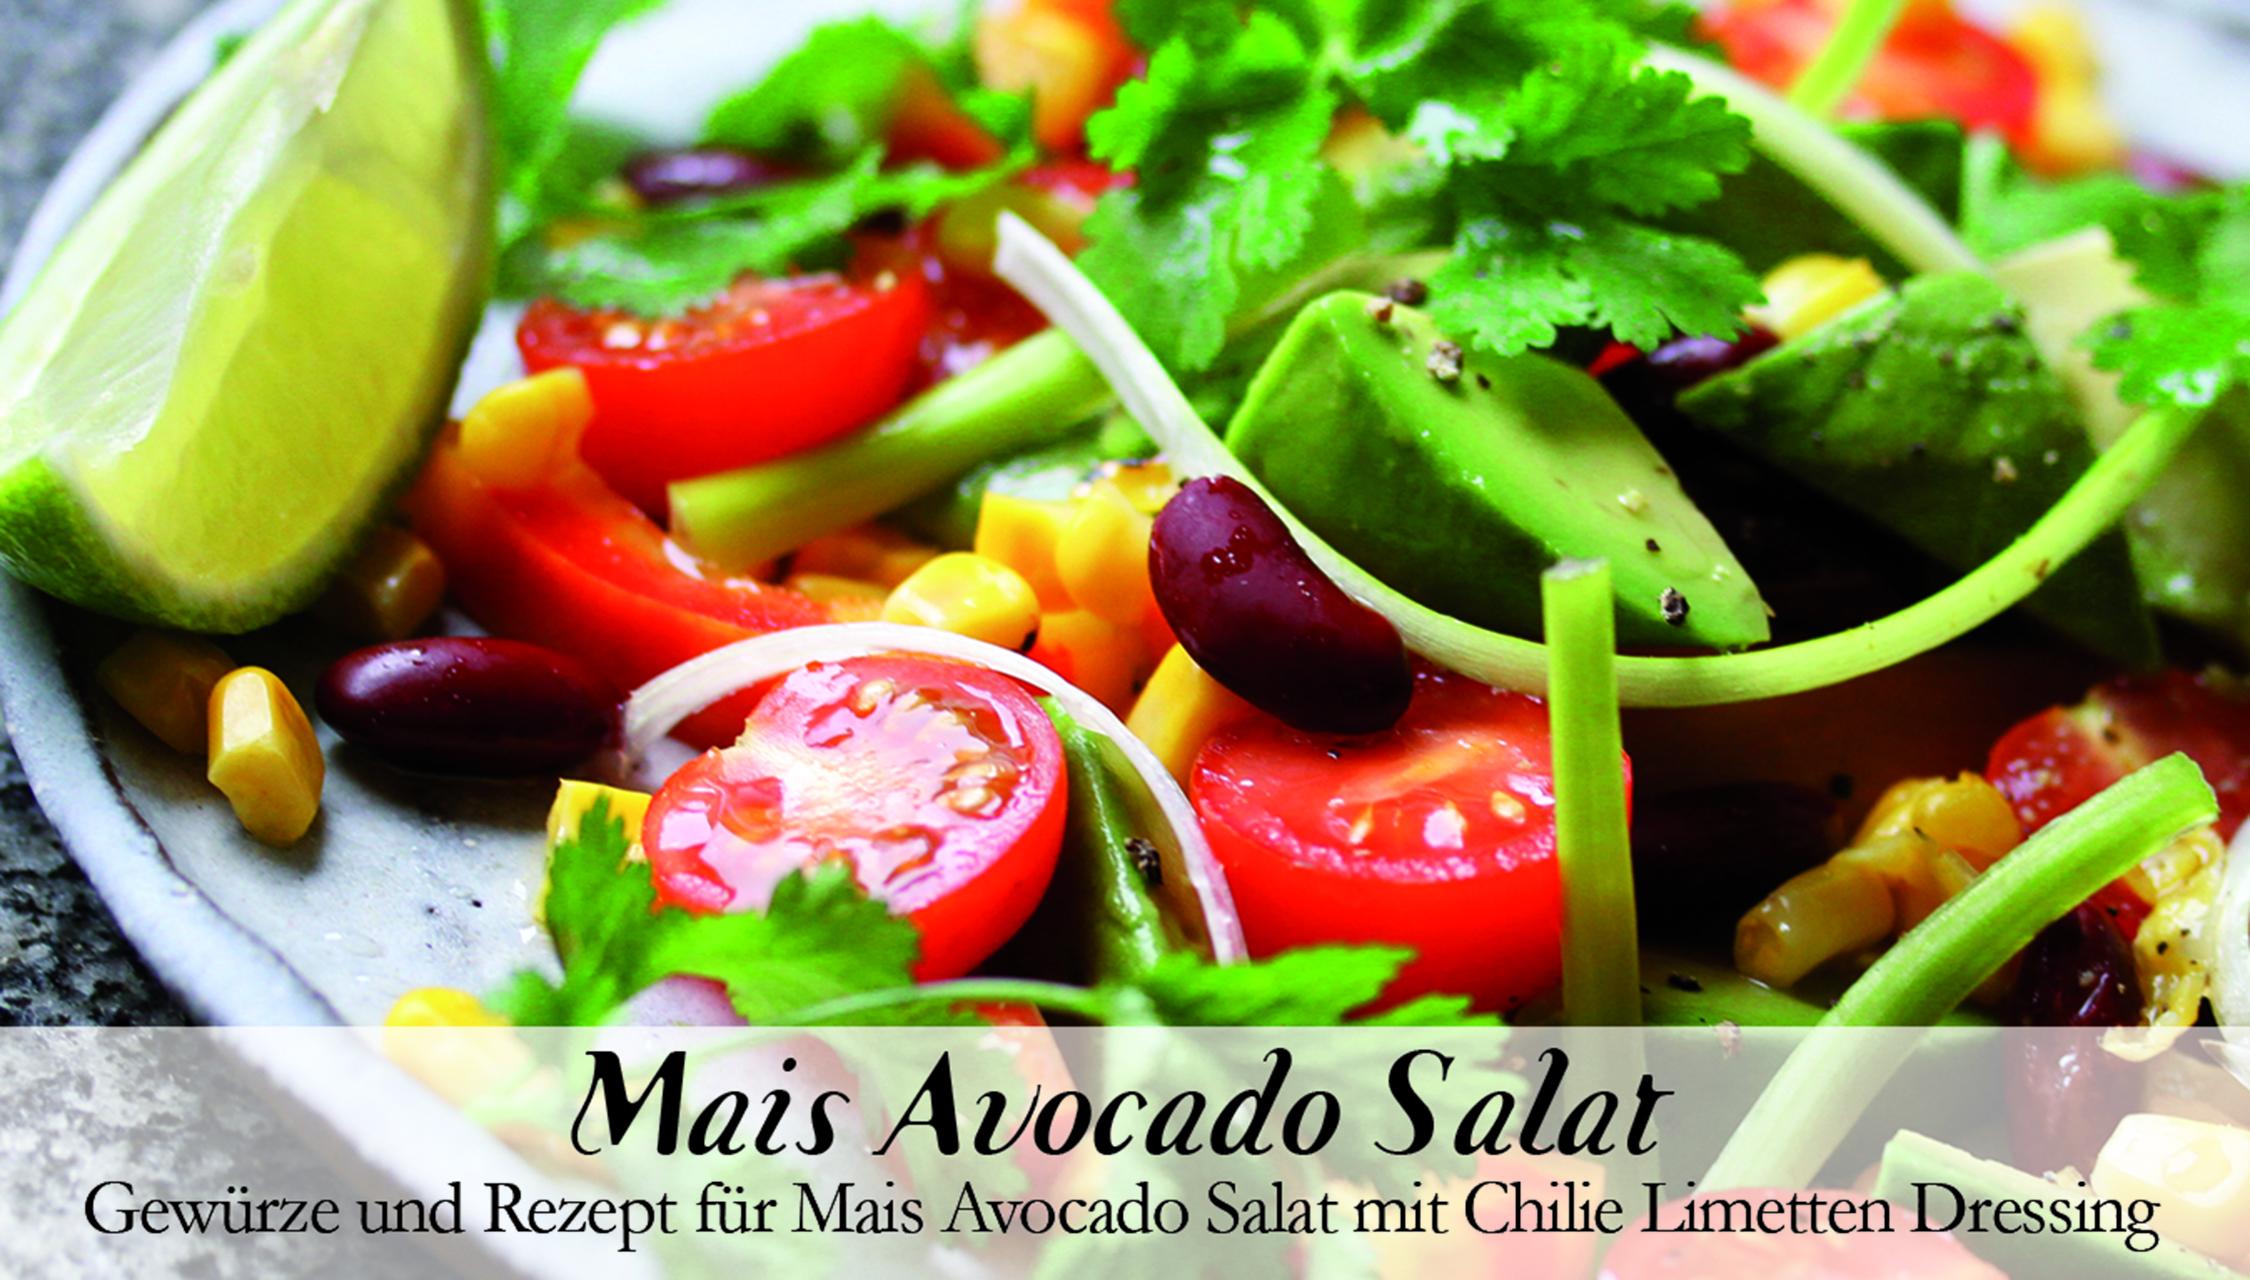 Mais Avocado Salat